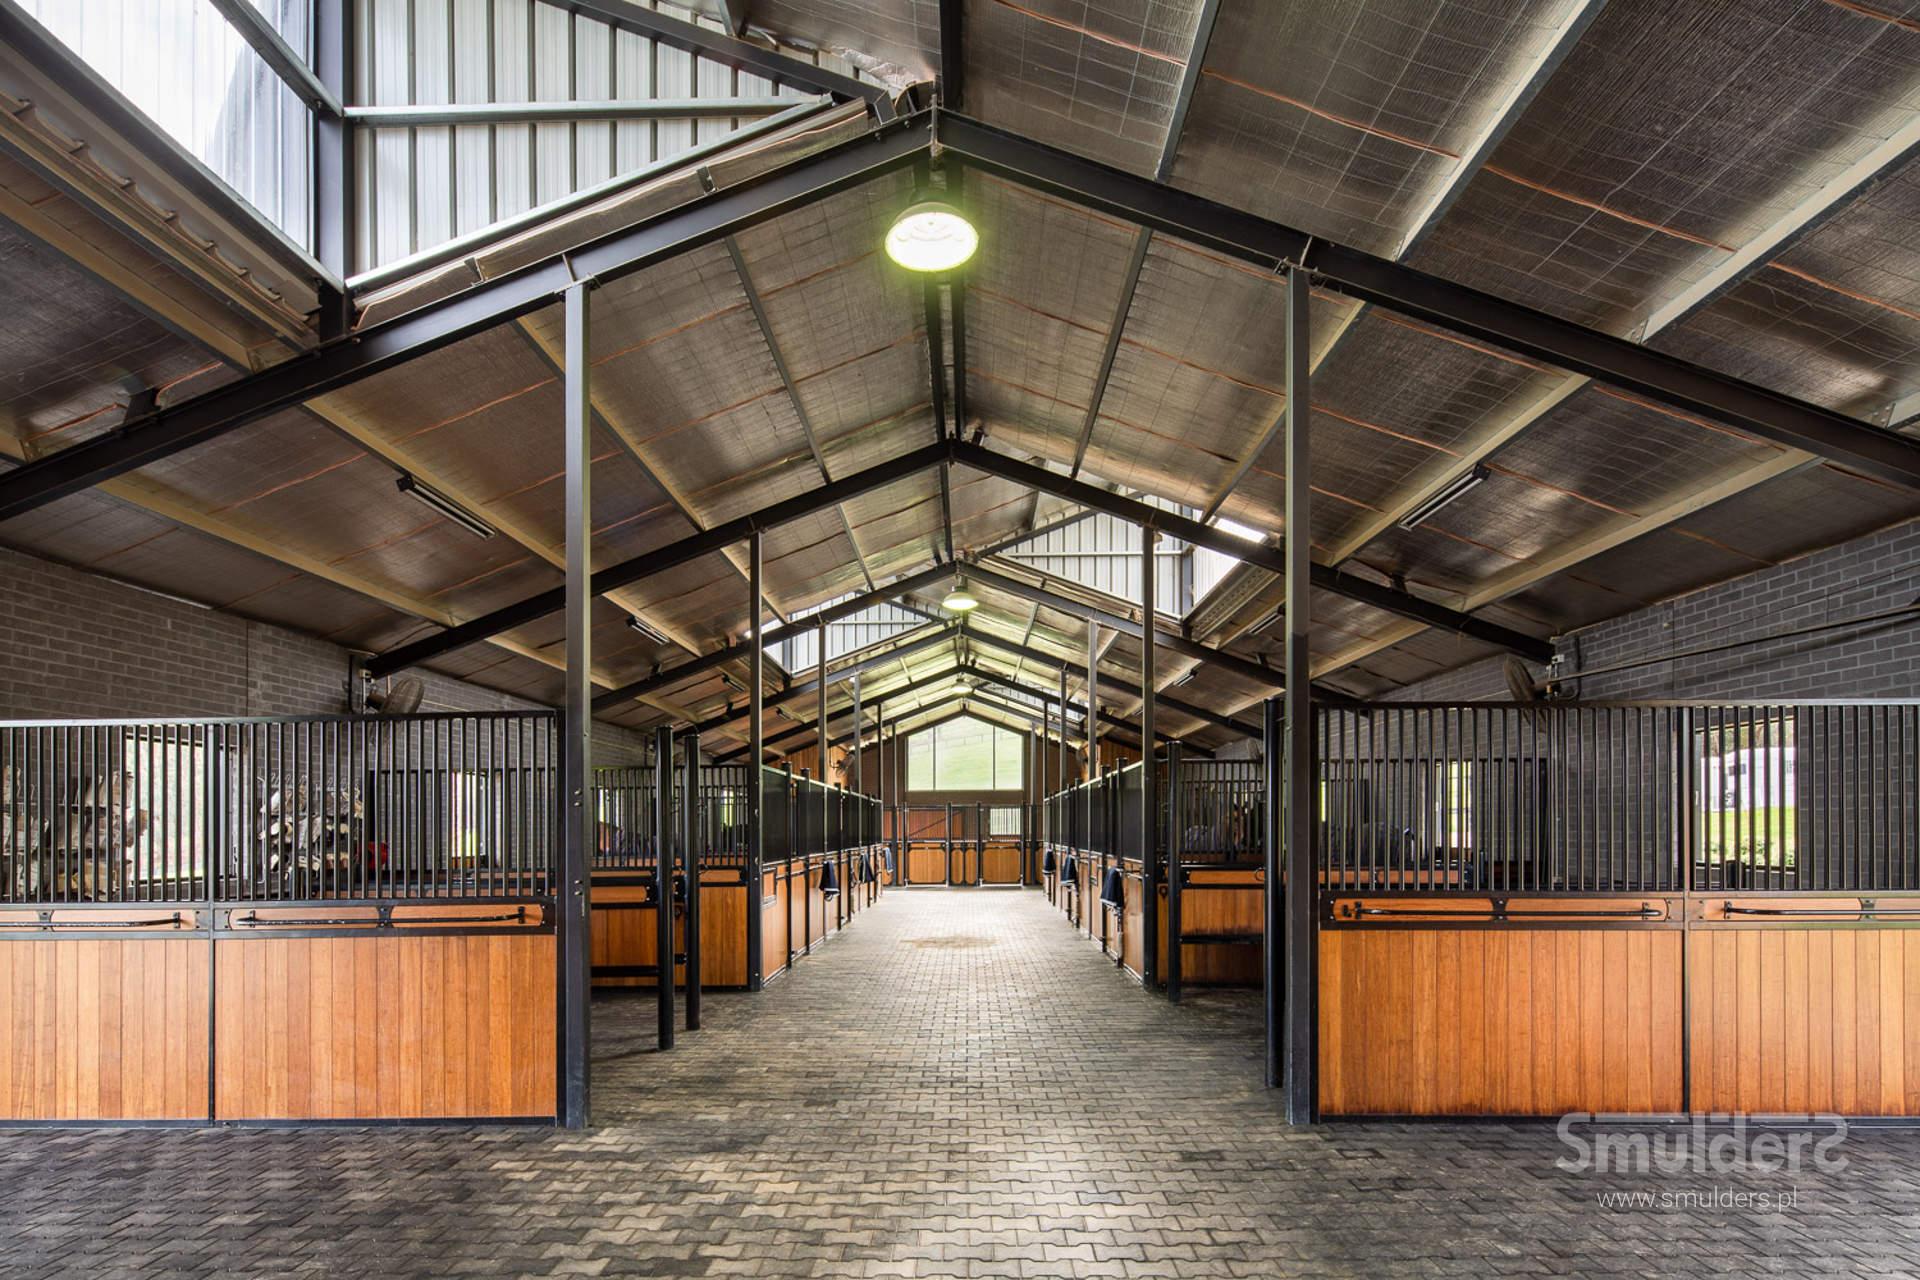 http://www.smulders.pl/wp-content/uploads/2019/10/f003_buckingham_barn-doors_doors_windows_KIL_SMULDERS_PL.jpg